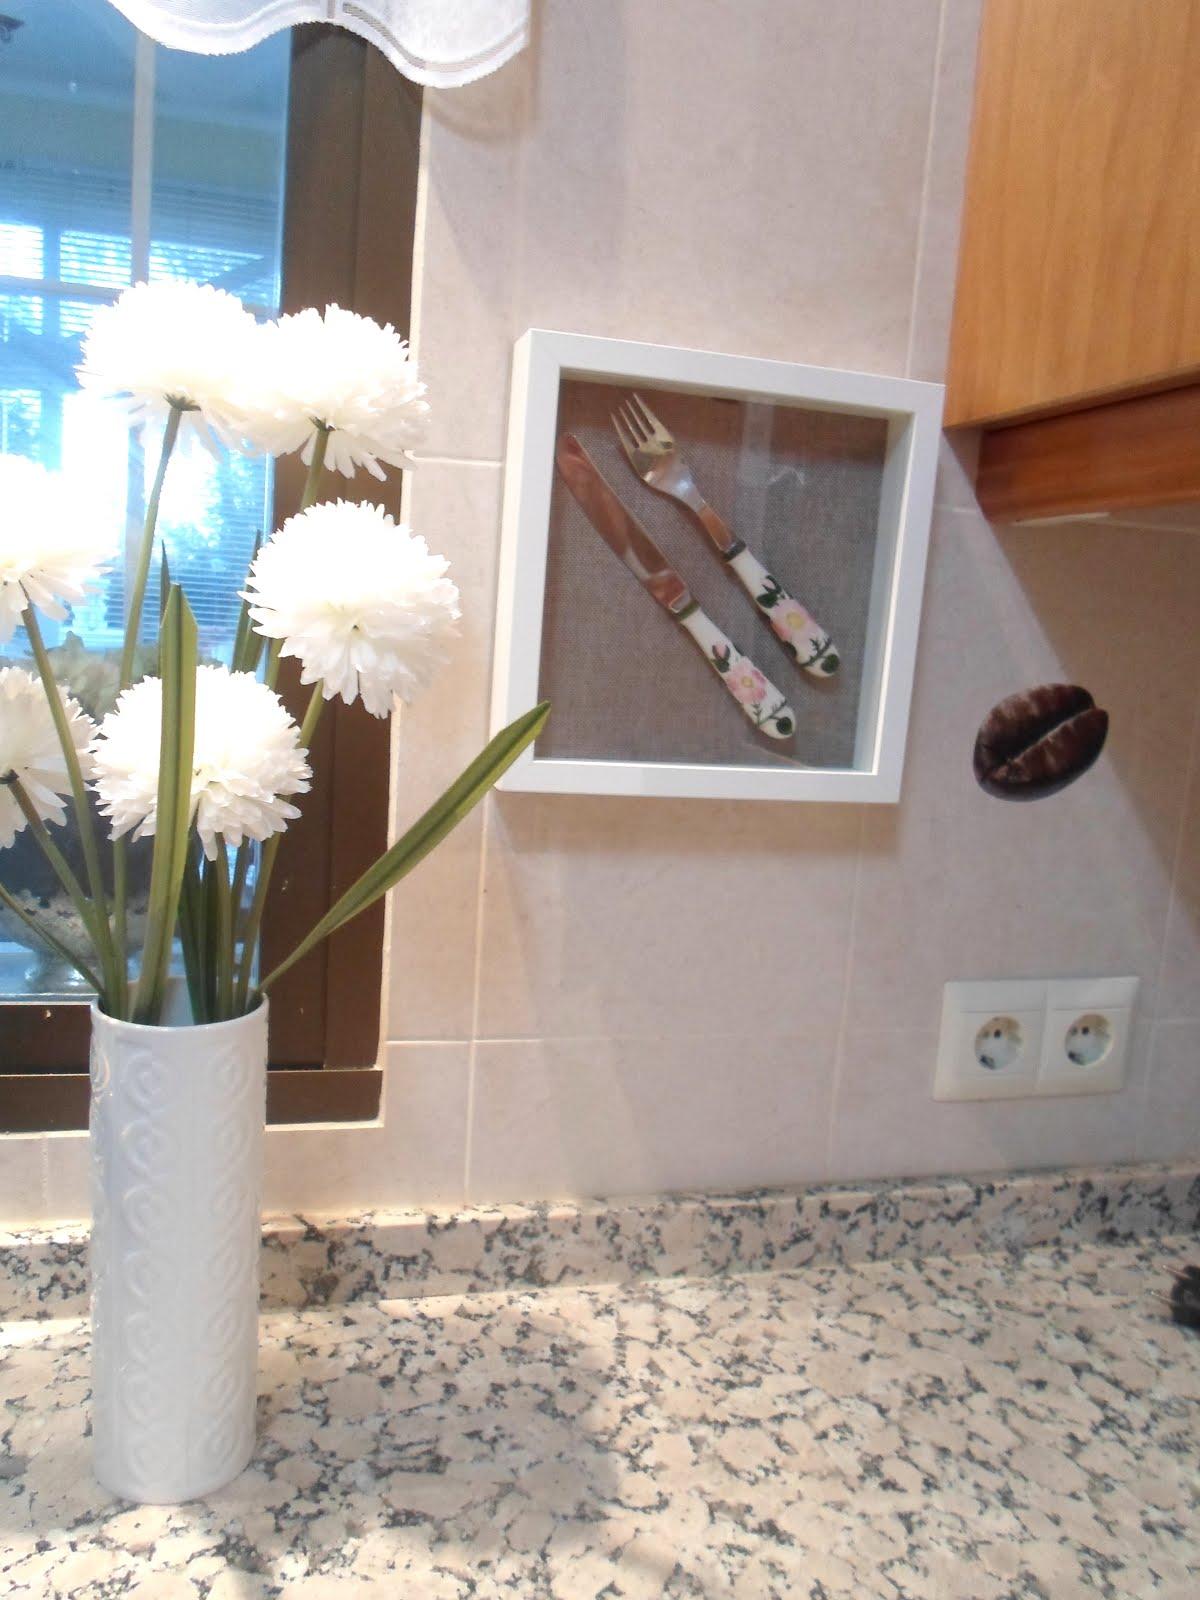 Dorable Ikea Ribba Marco De Imagen Motivo - Ideas Personalizadas de ...